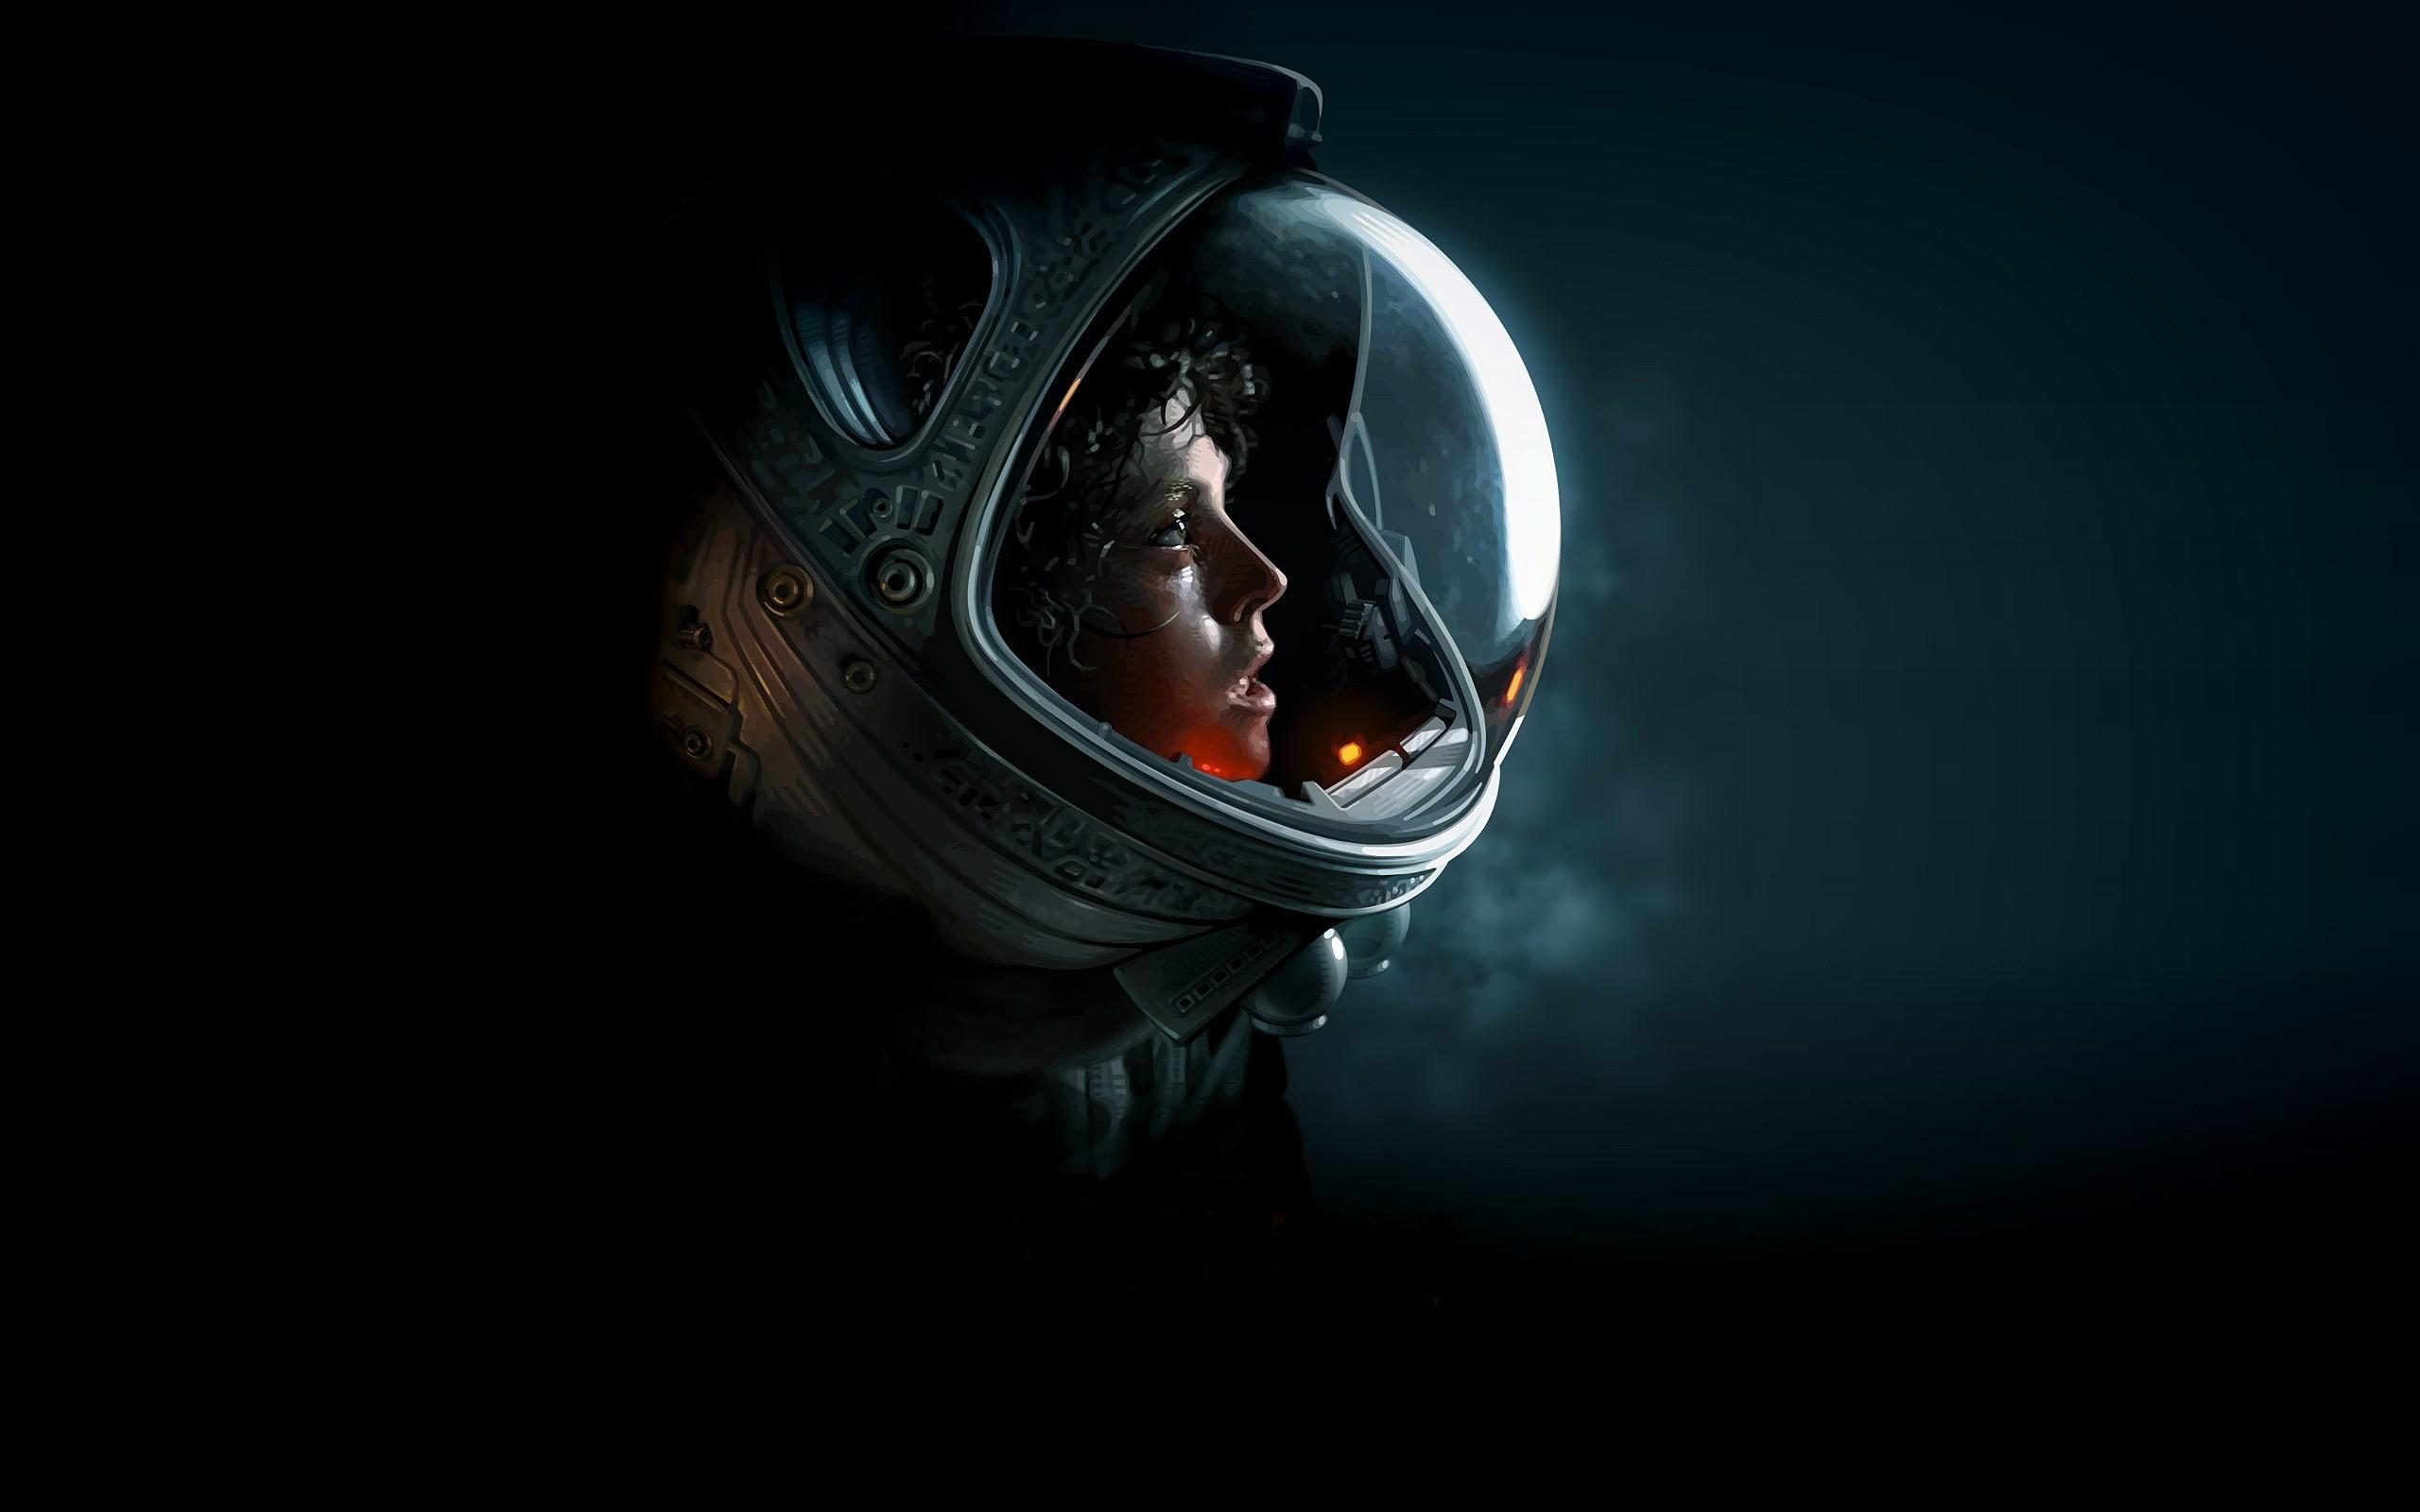 Top Wallpaper Movie Black - black-night-artwork-science-fiction-Alien-movie-space-suit-Ellen-Ripley-Sigourney-Weaver-light-darkness-screenshot-computer-wallpaper-103109  Best Photo Reference_407437.jpg